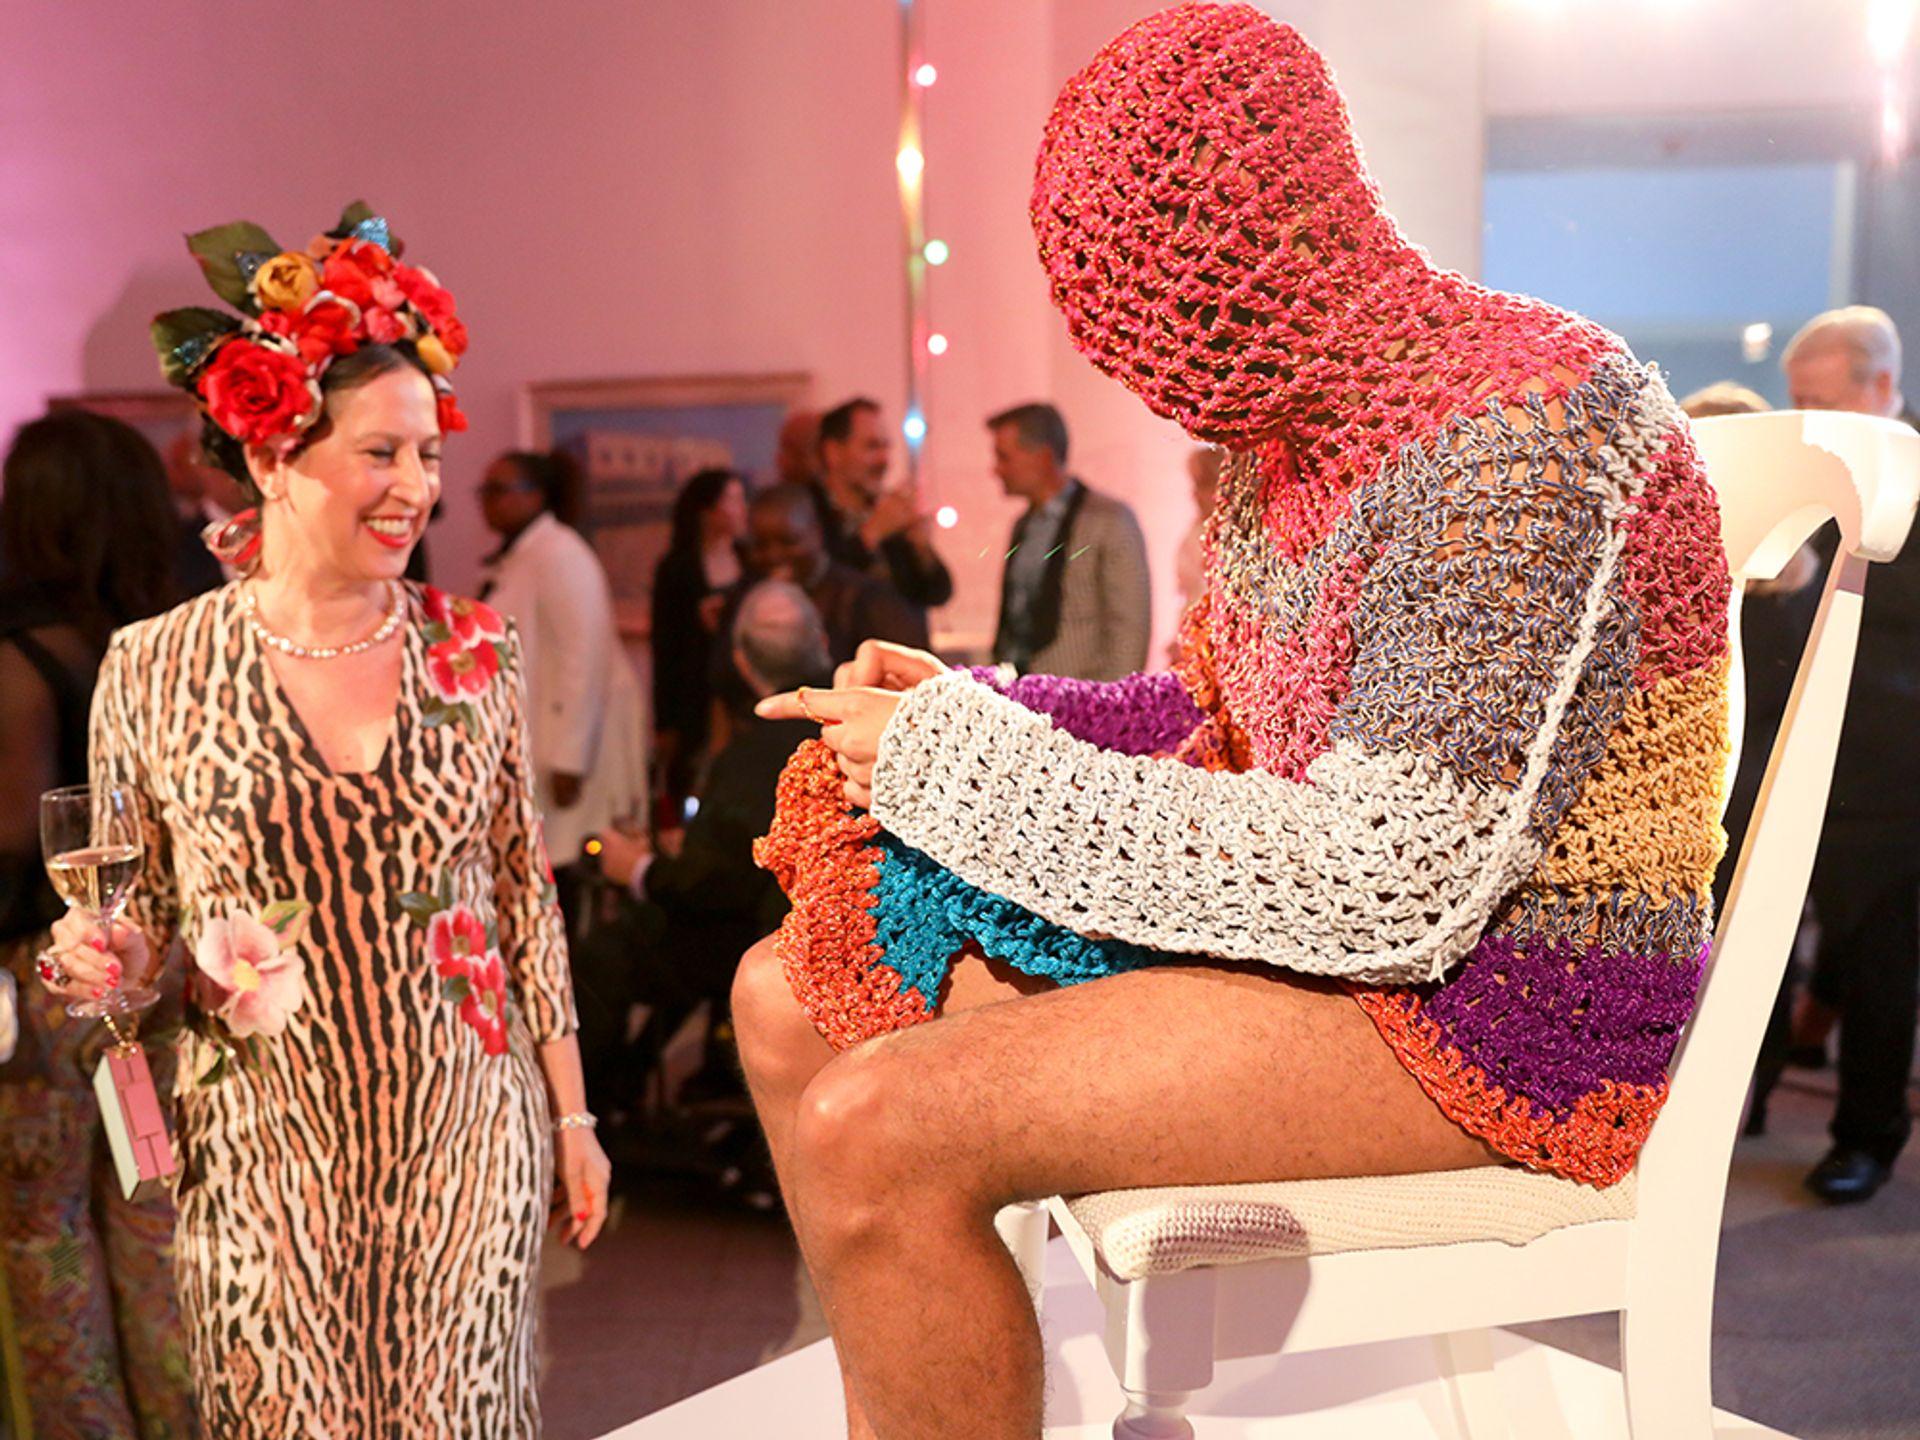 A bold crocheted performance at the Brooklyn Artists Ball Photo: Benjamin Lozovsky/BFA.com